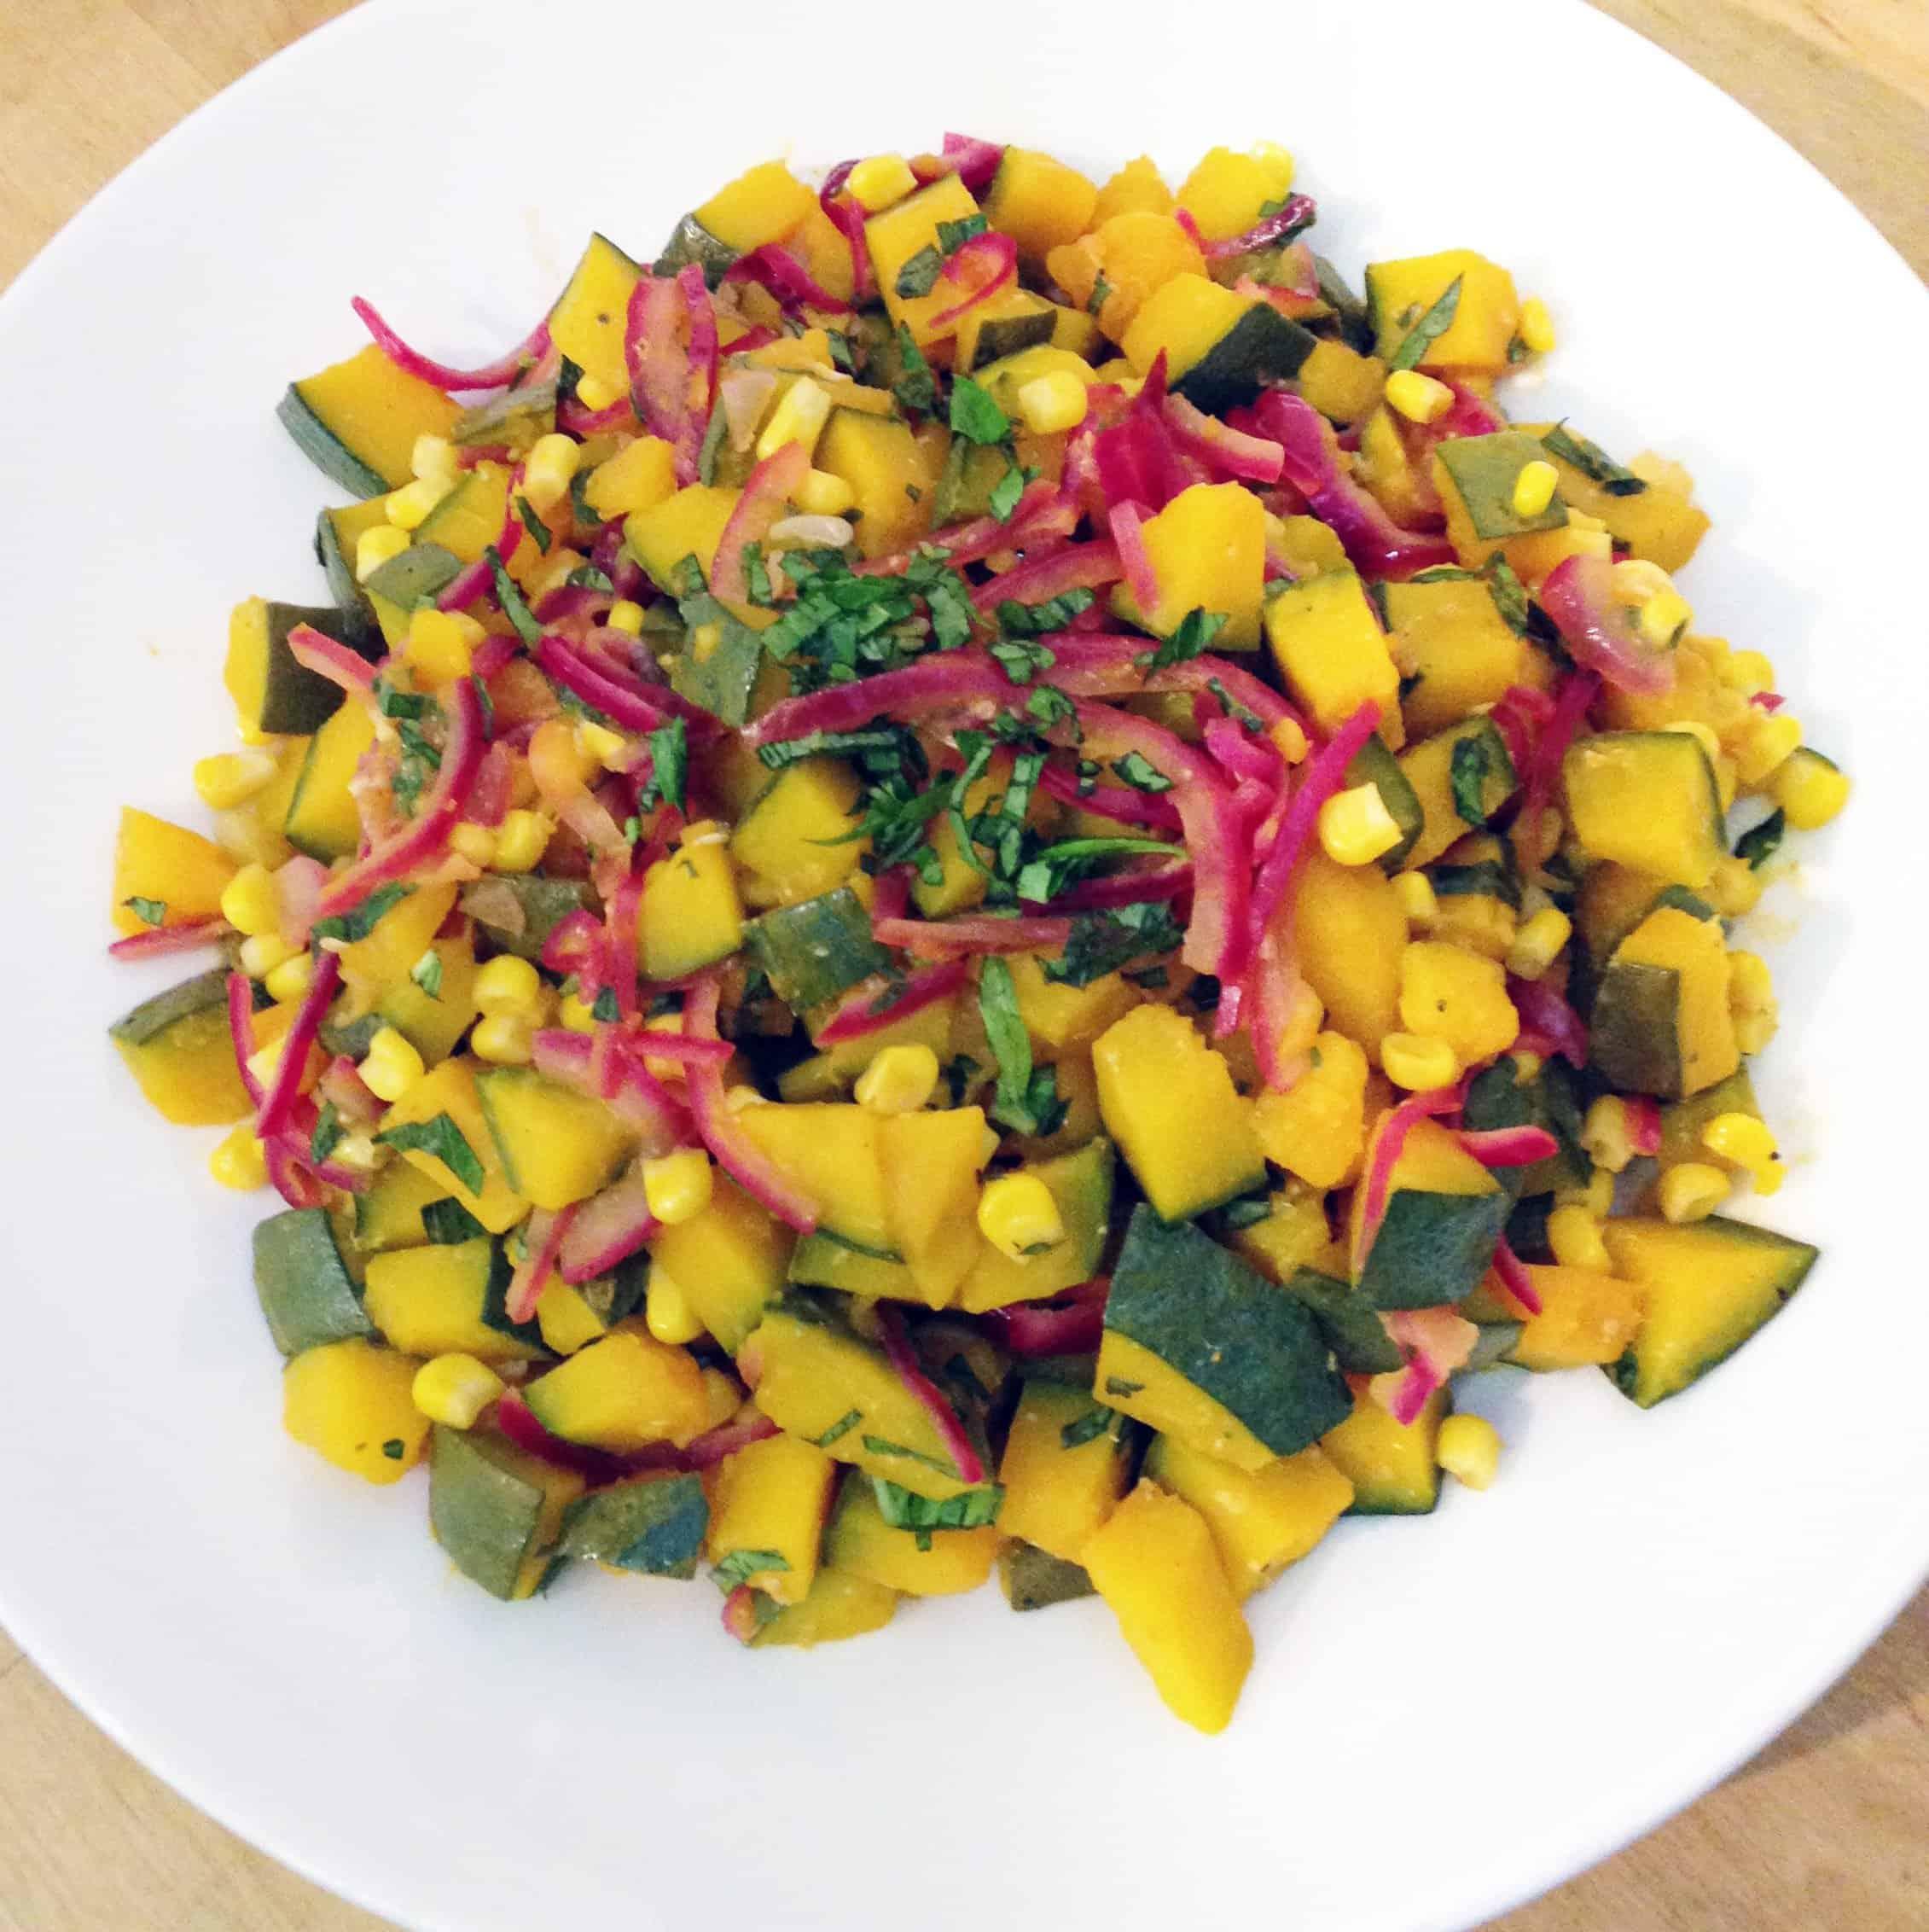 Winter Squash Salad